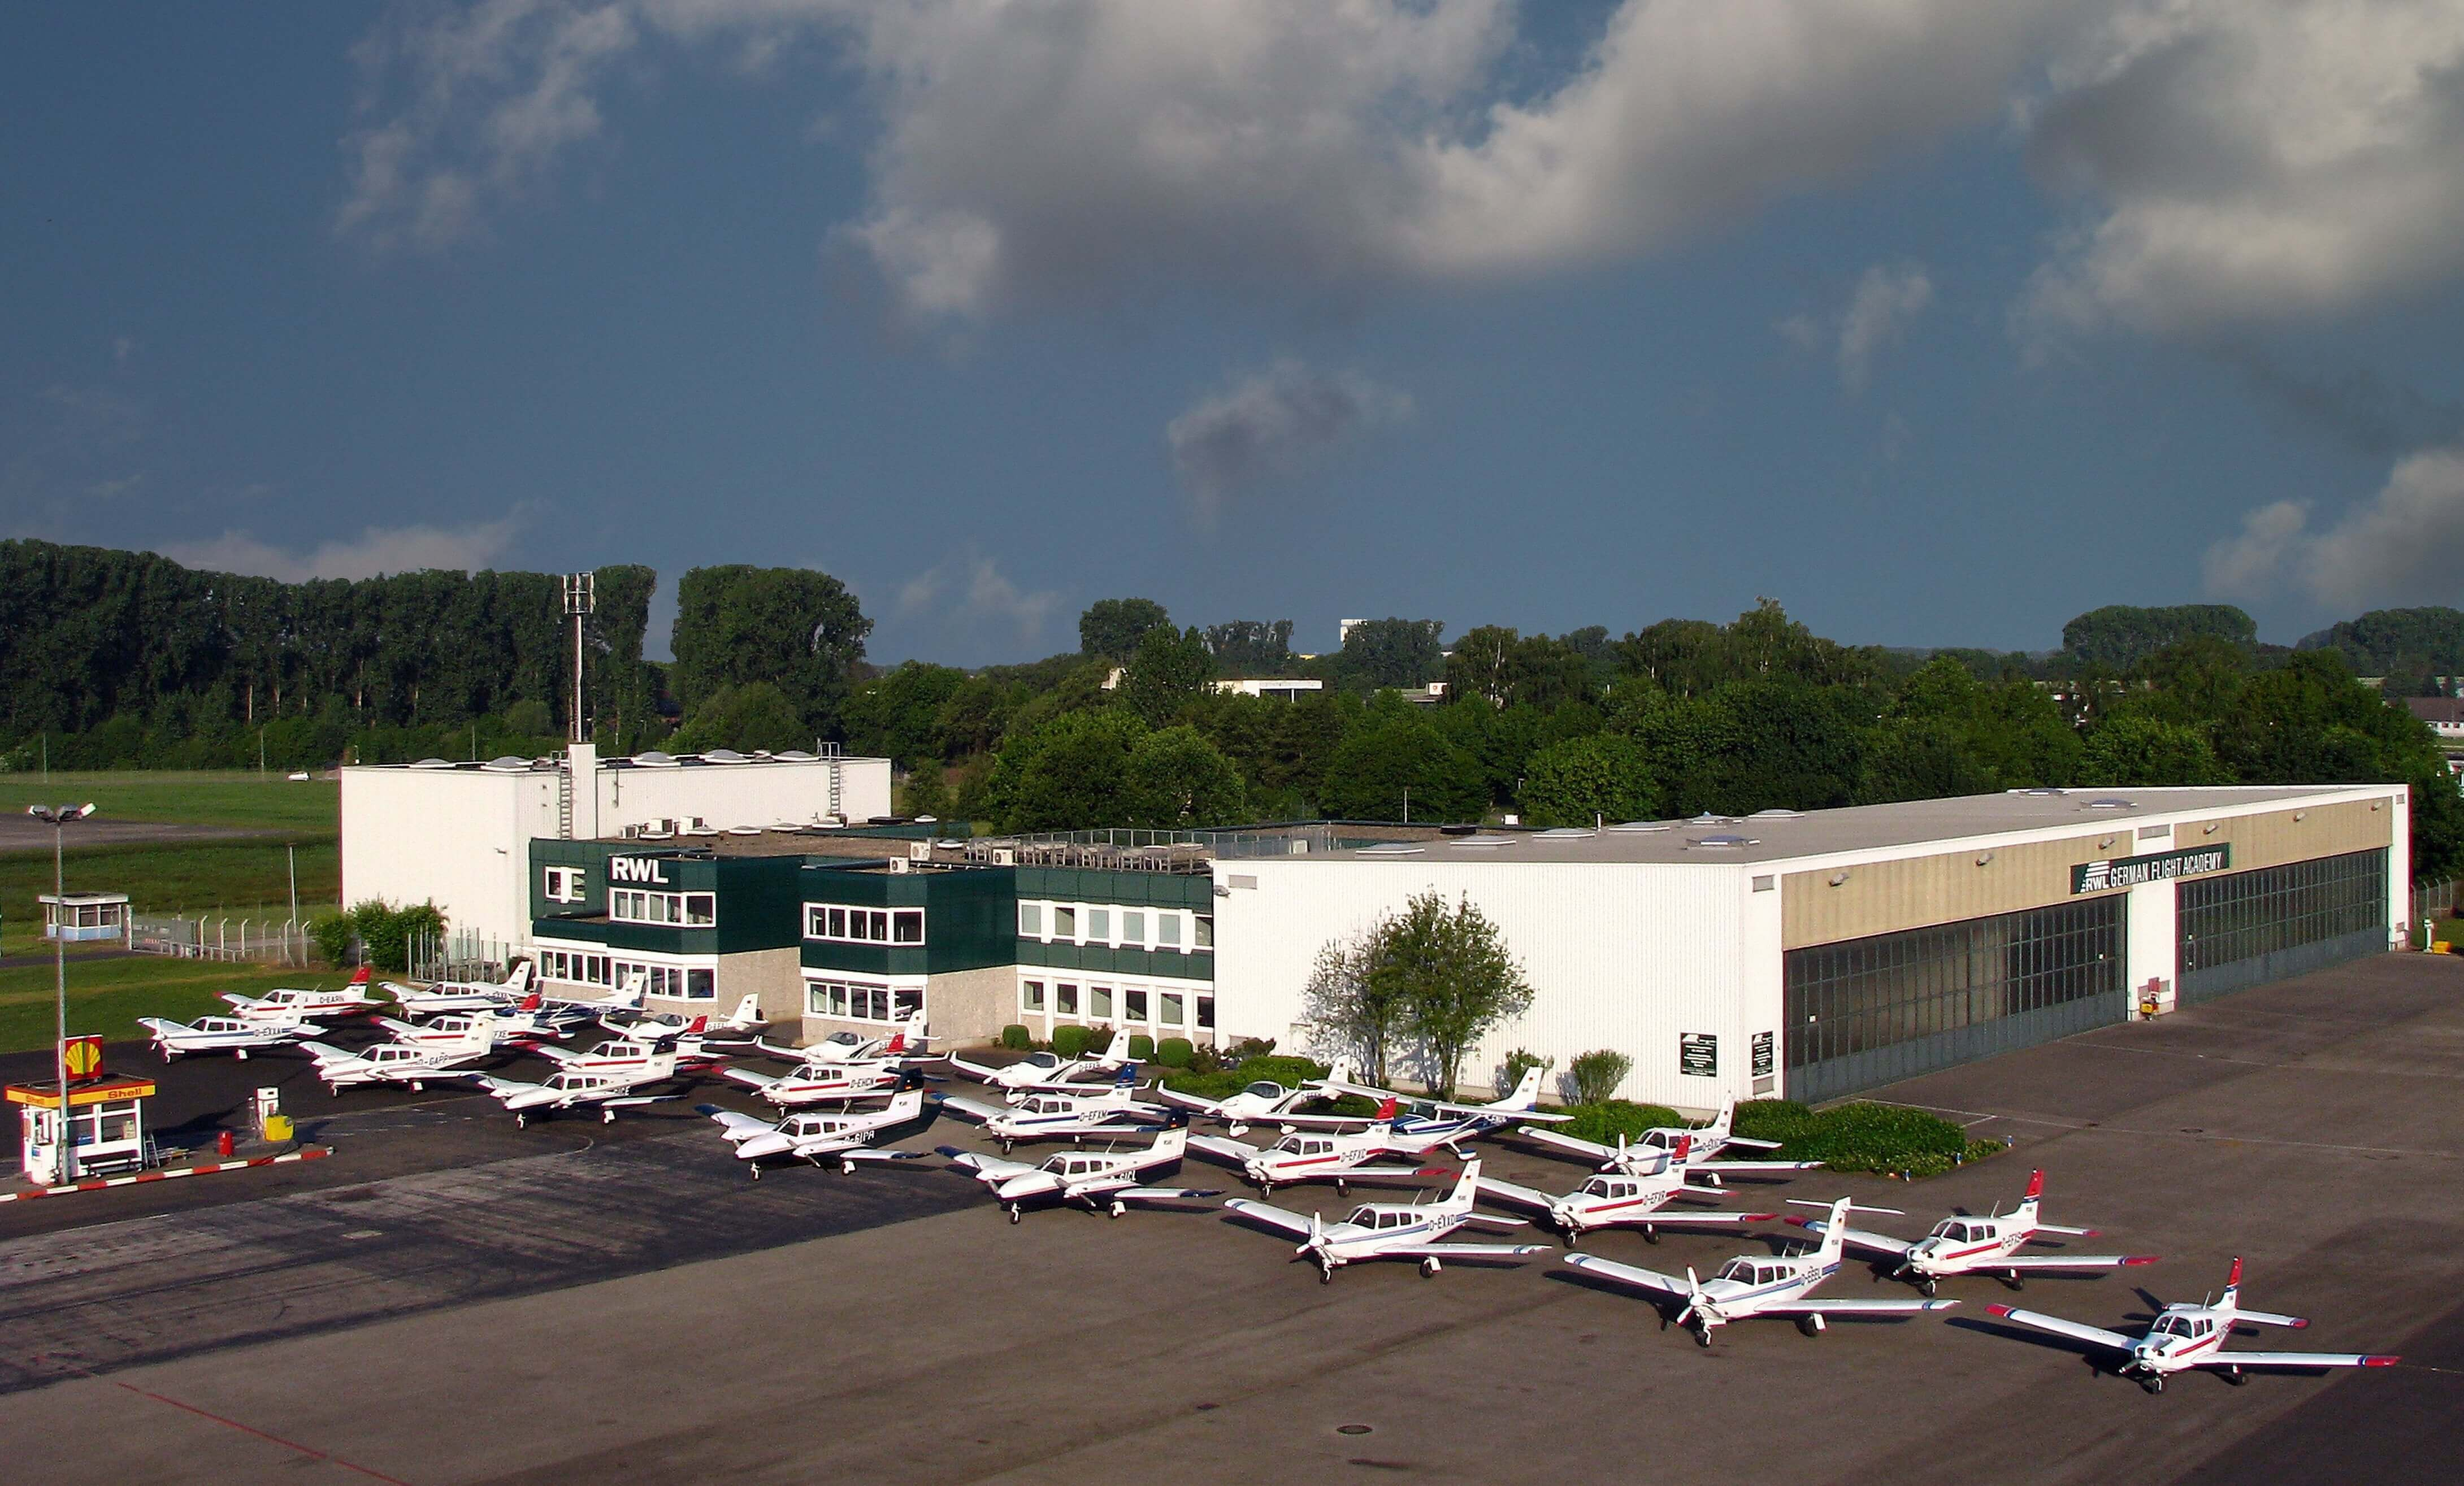 RWL Flugschule Mönchengladbach - Flugzeugflotte